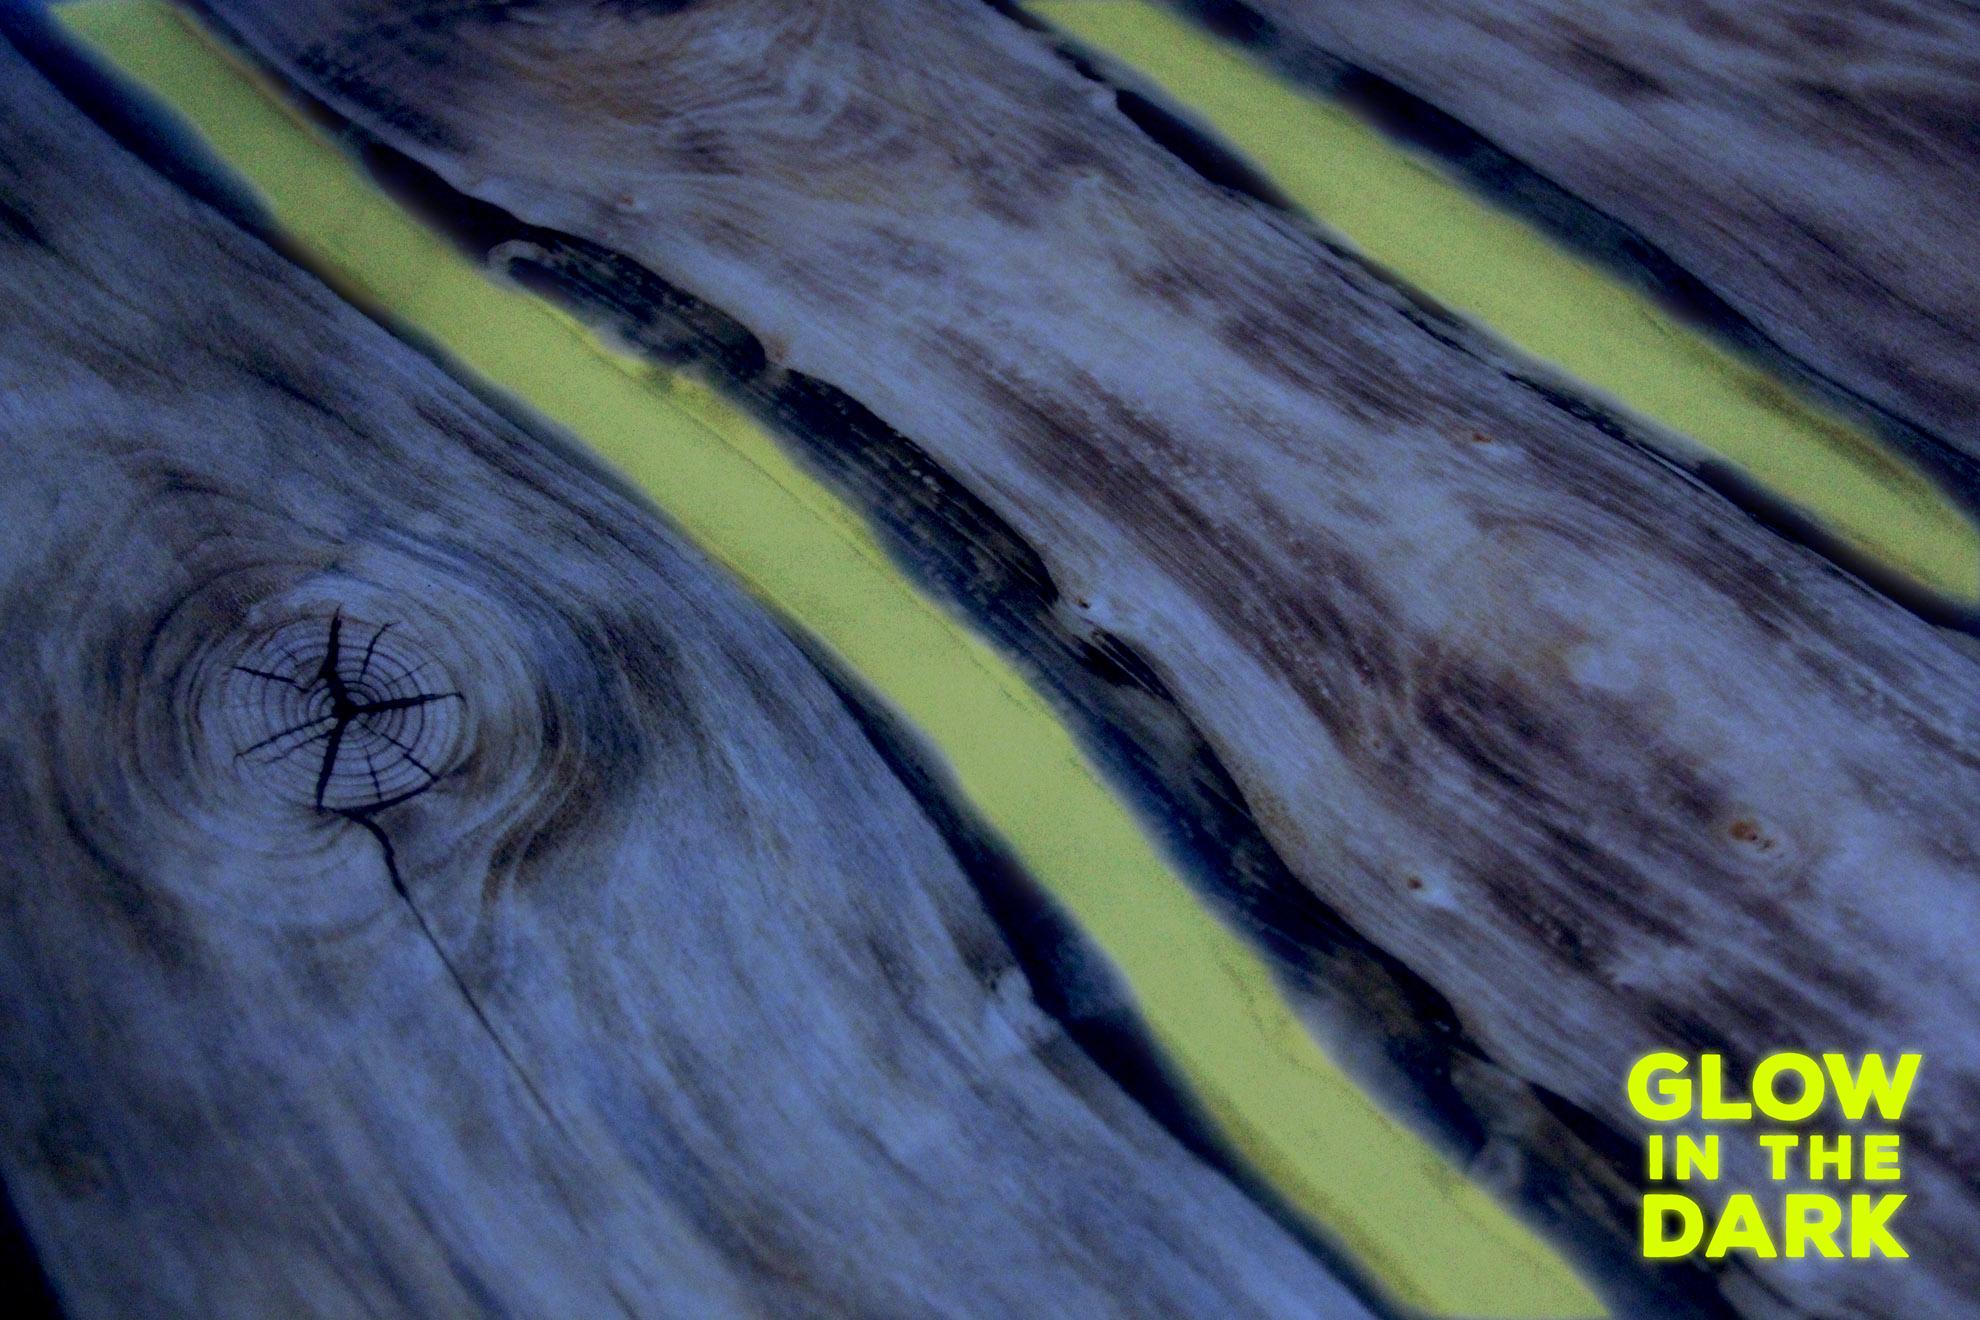 wood-table-glow-1